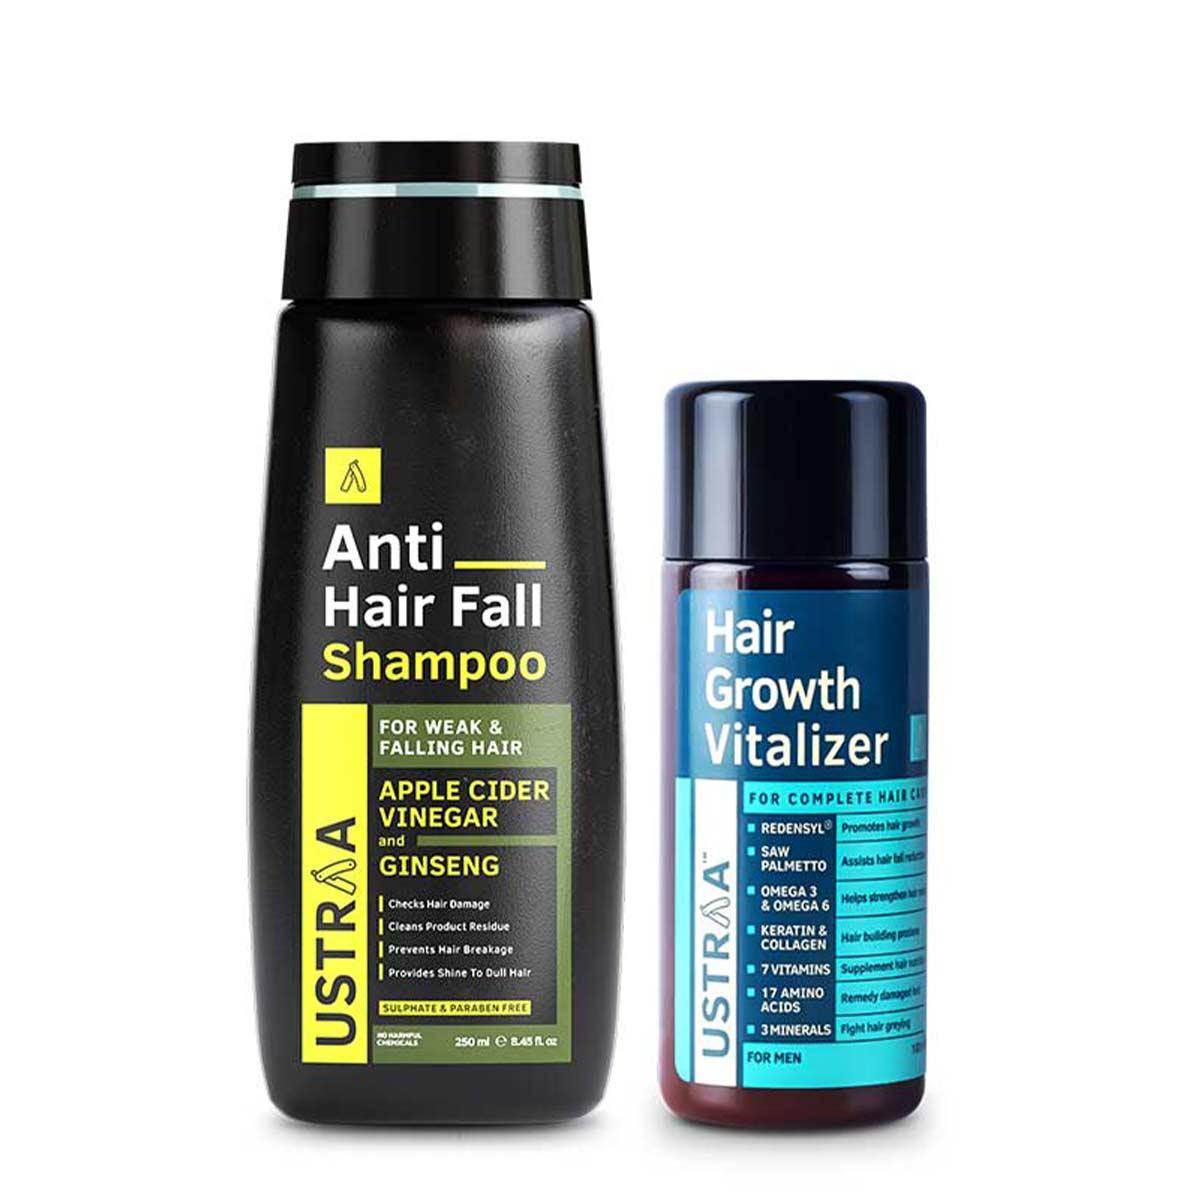 Ustraa Complete Hair Fall Kit for Men   Hair Growth Vitalizer (100 ml) + Anti-fall Shampoo (250 ml)